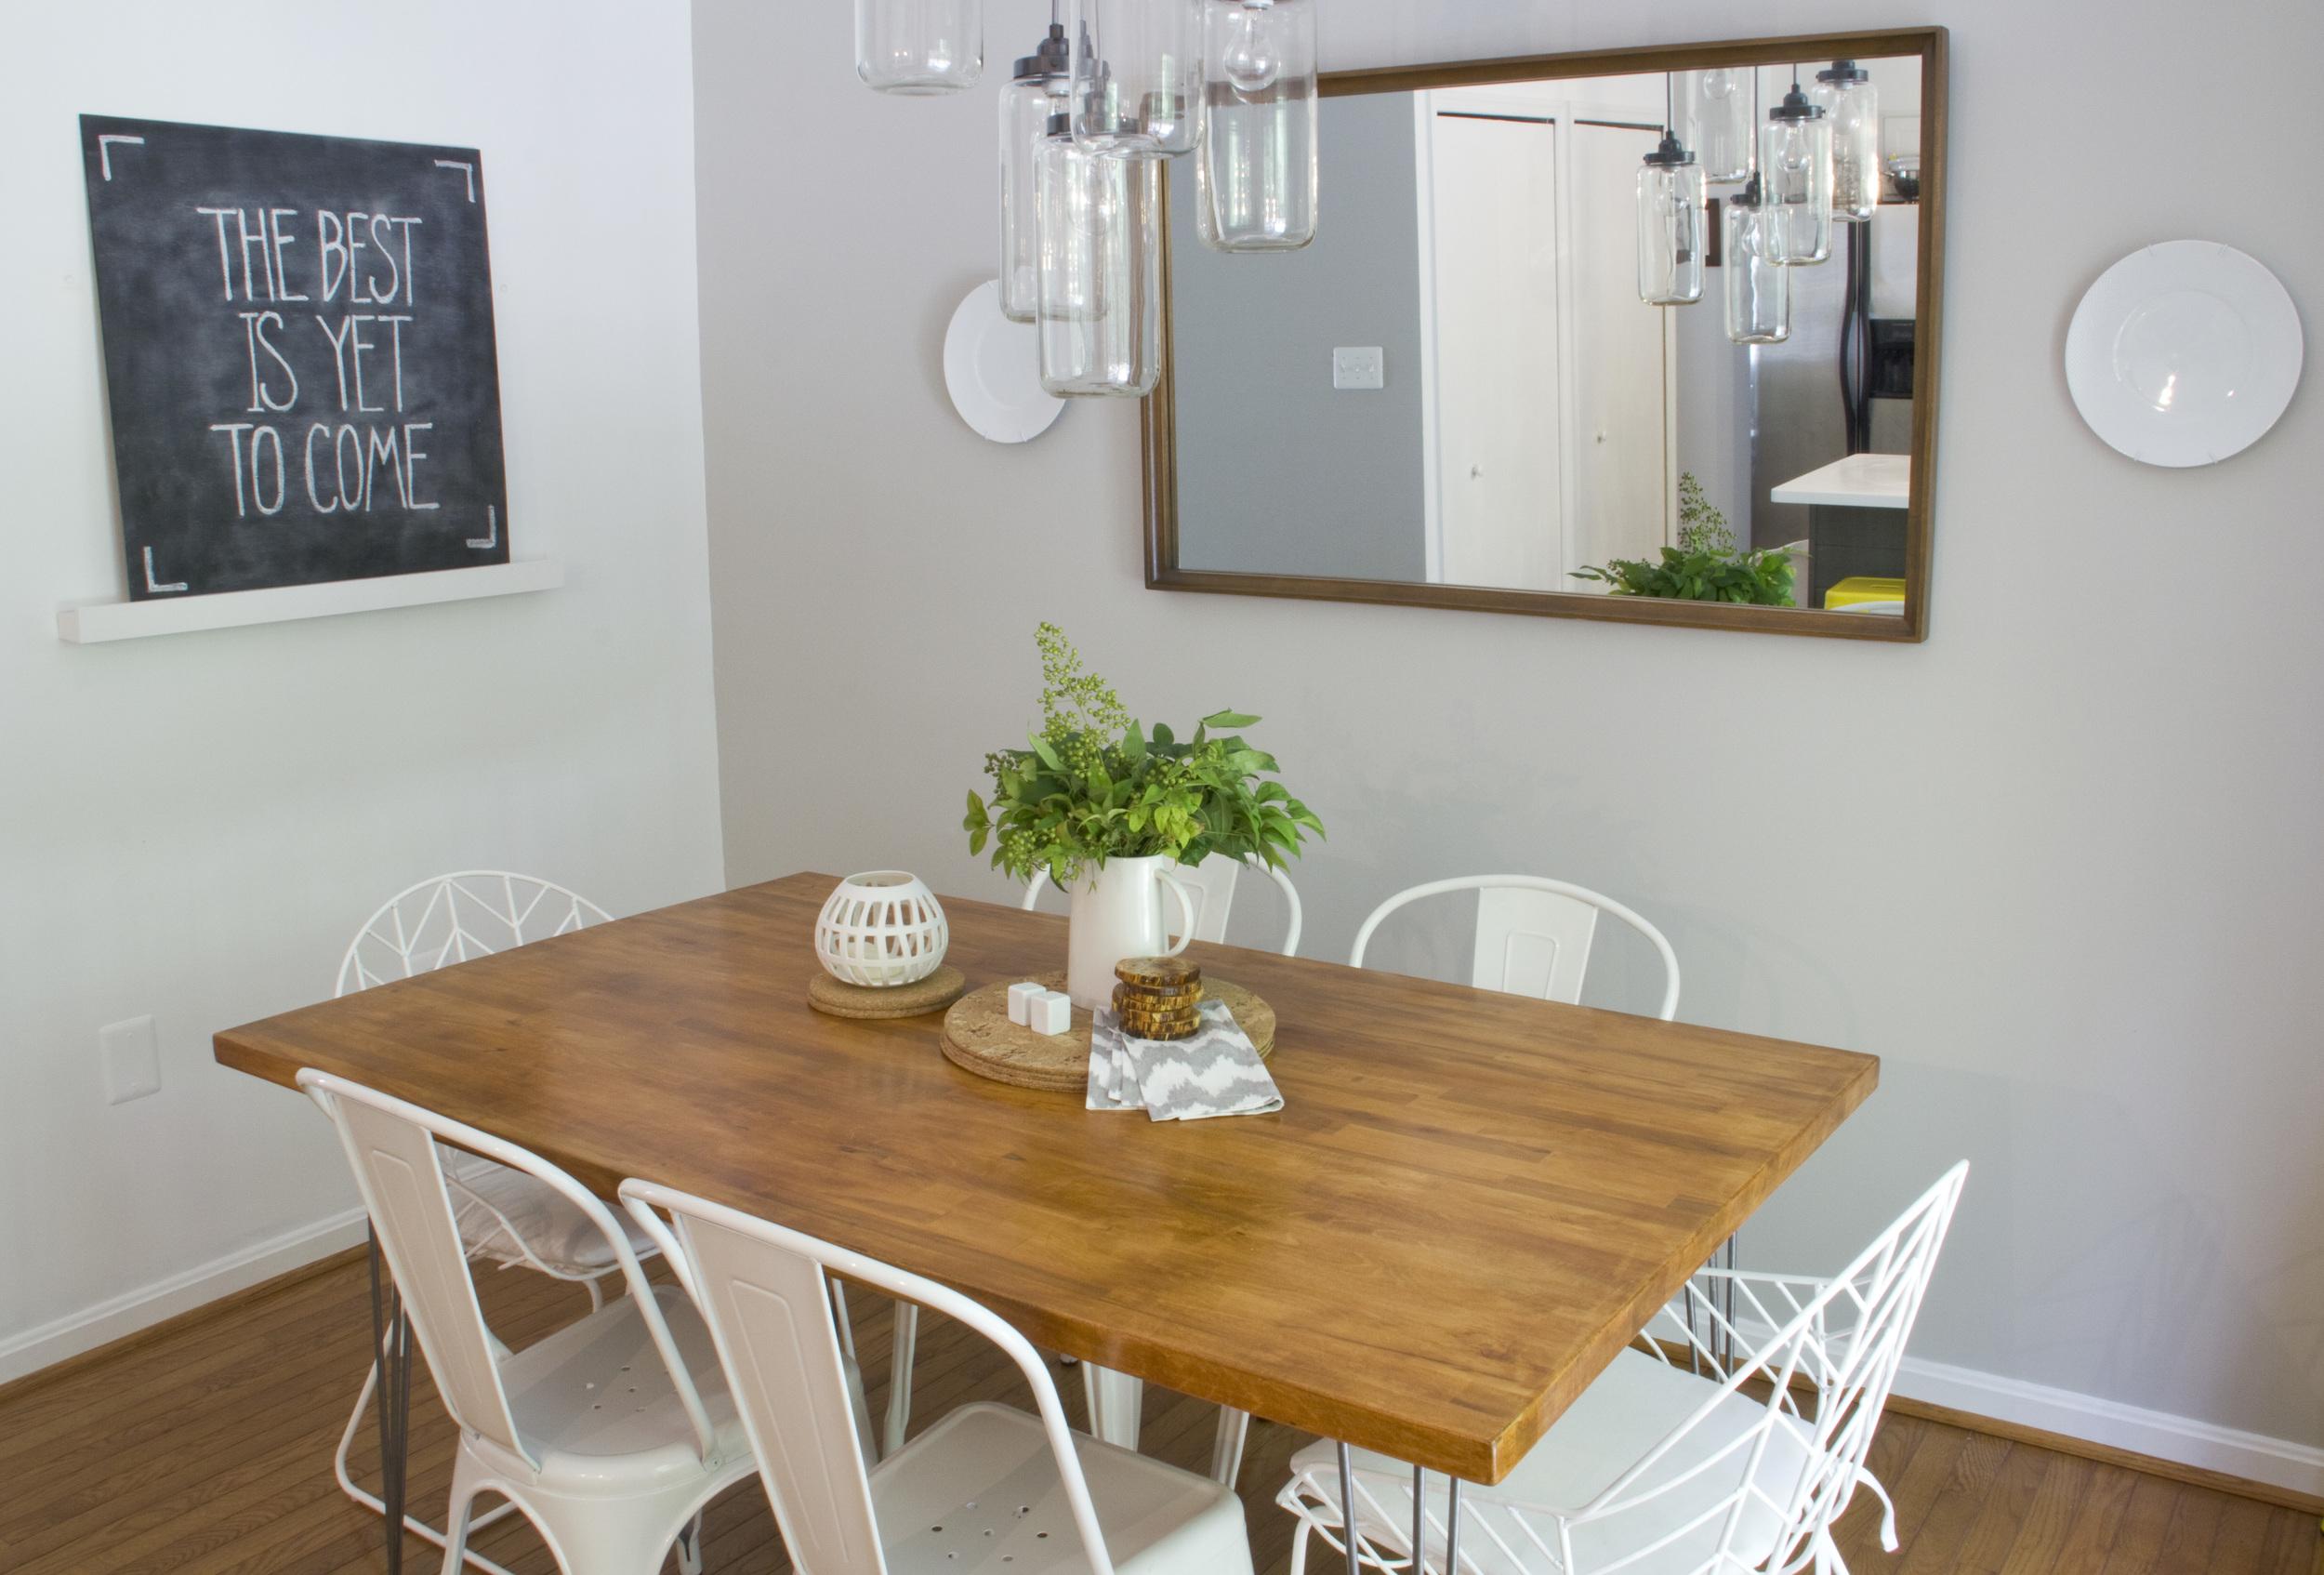 KitchenRemodel_Table2_CC1.jpg